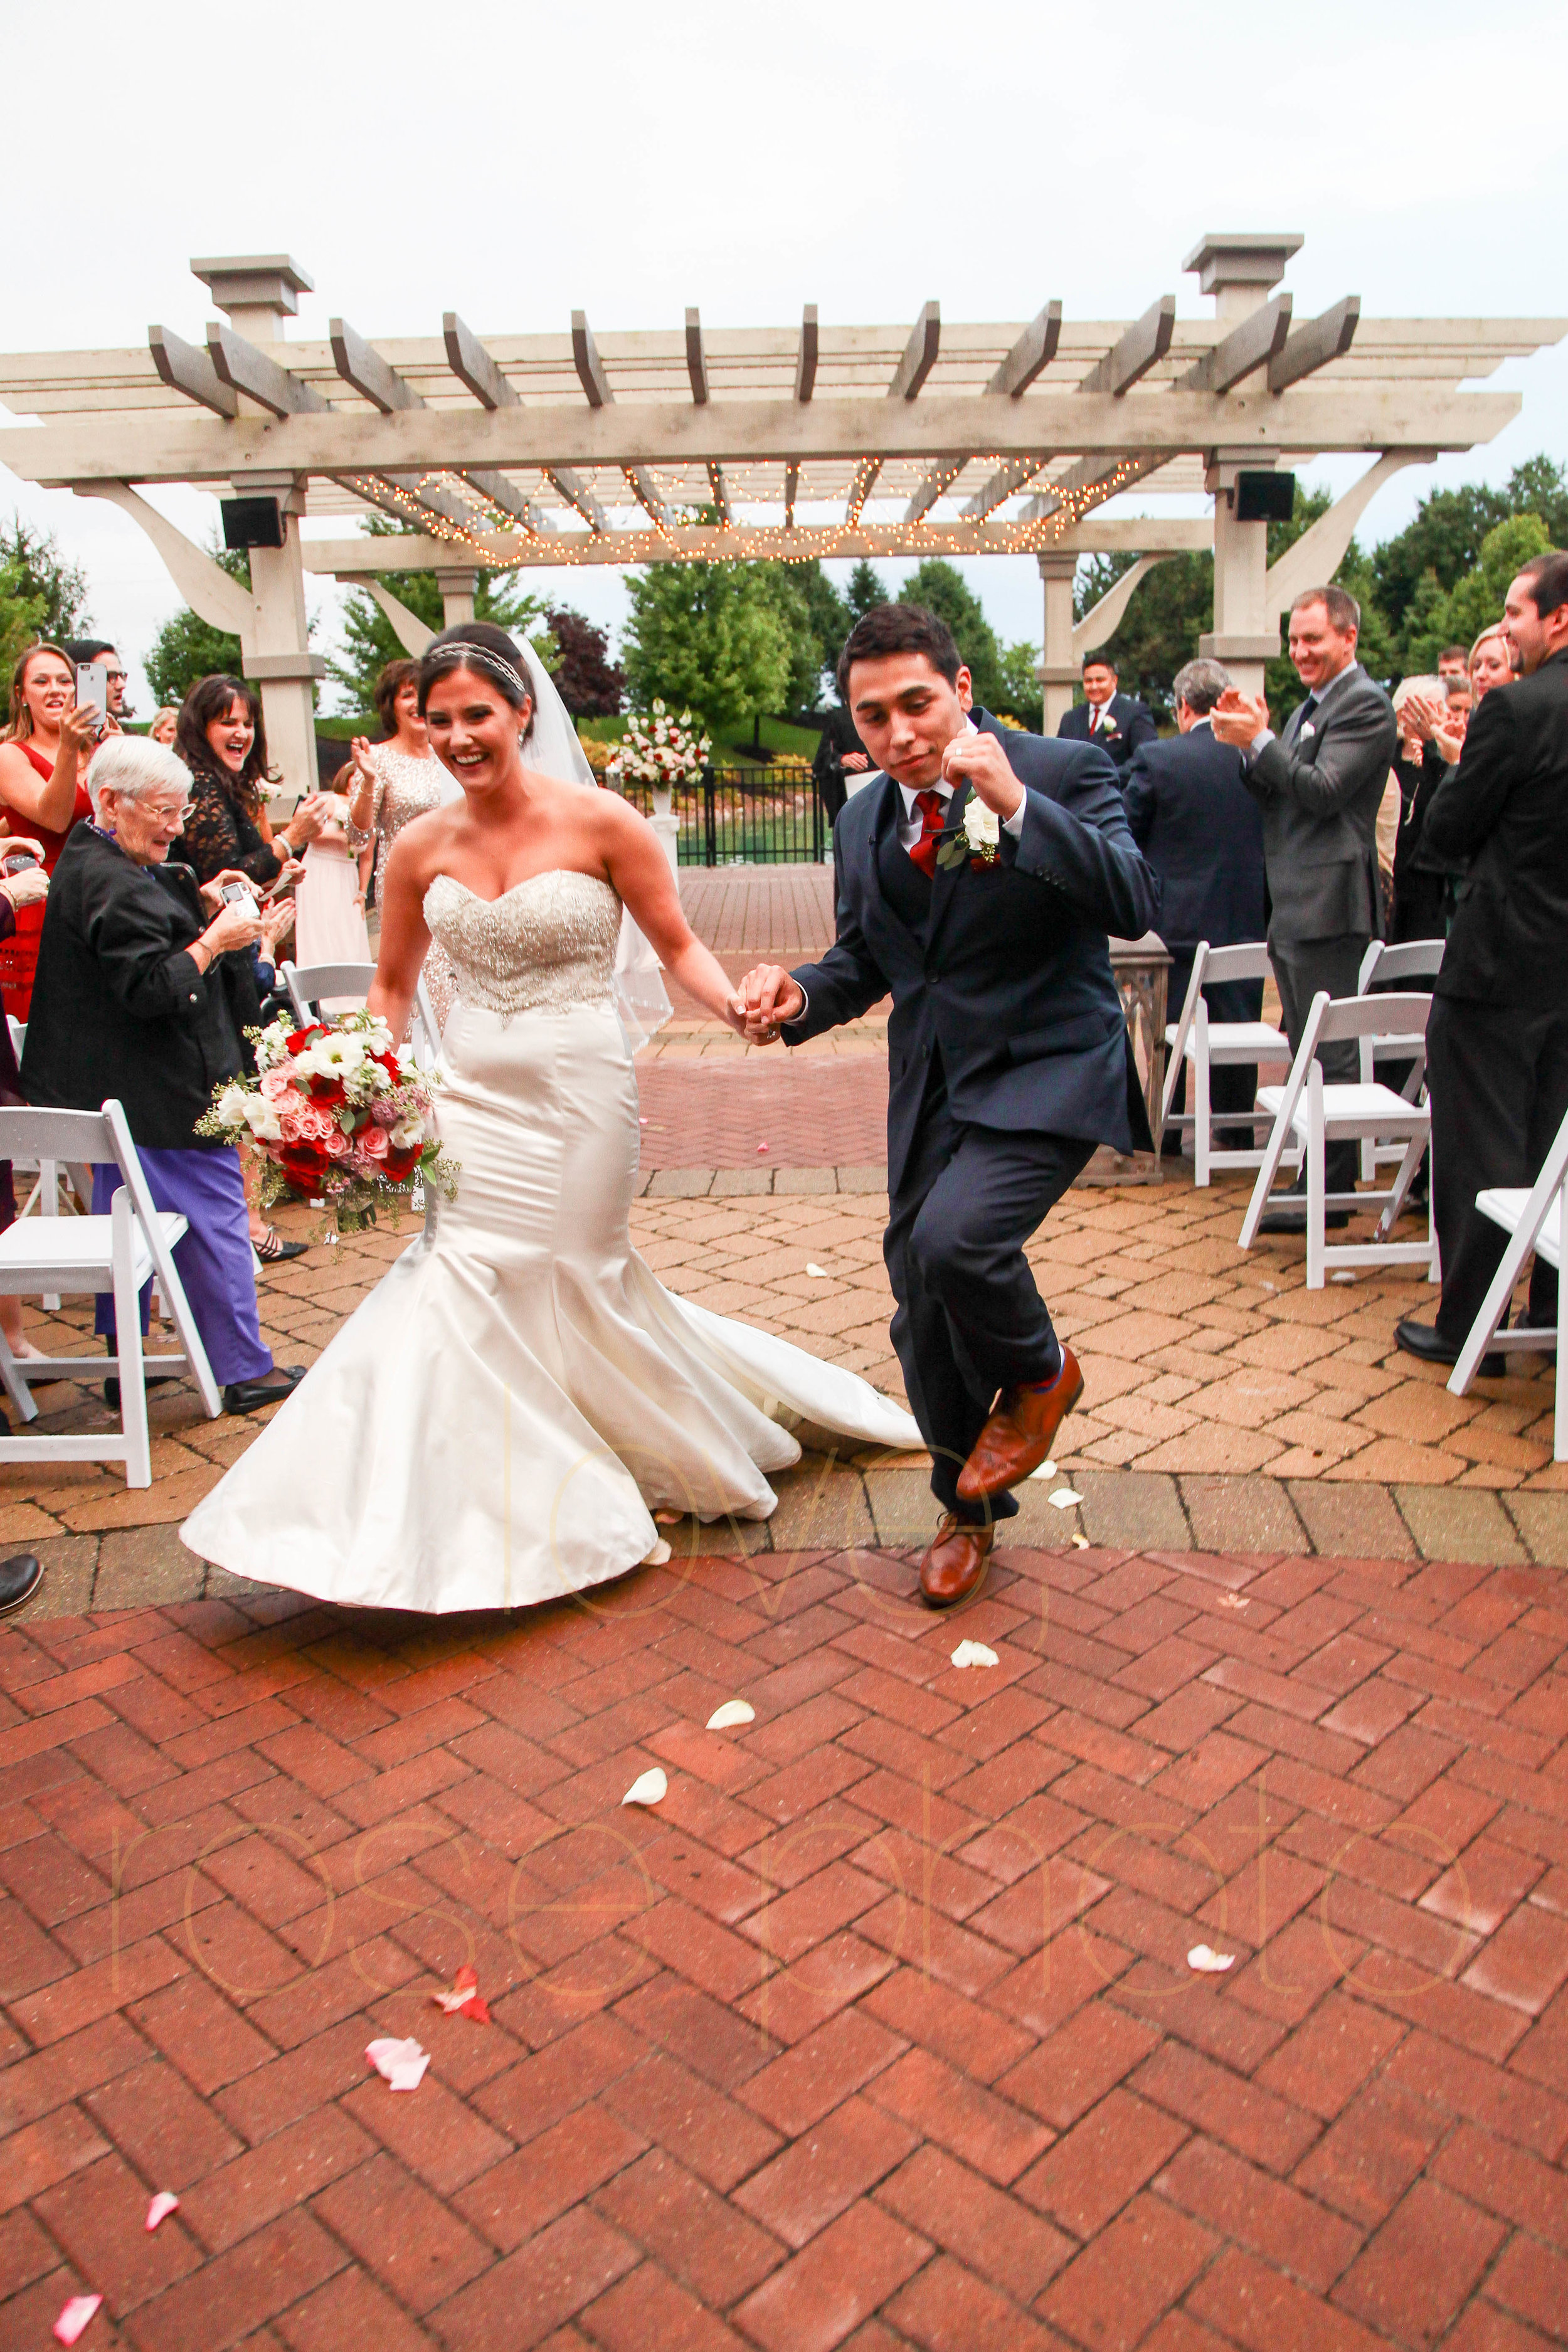 Alison + Mike Chicago Wedding Photographer Blog -38.jpg